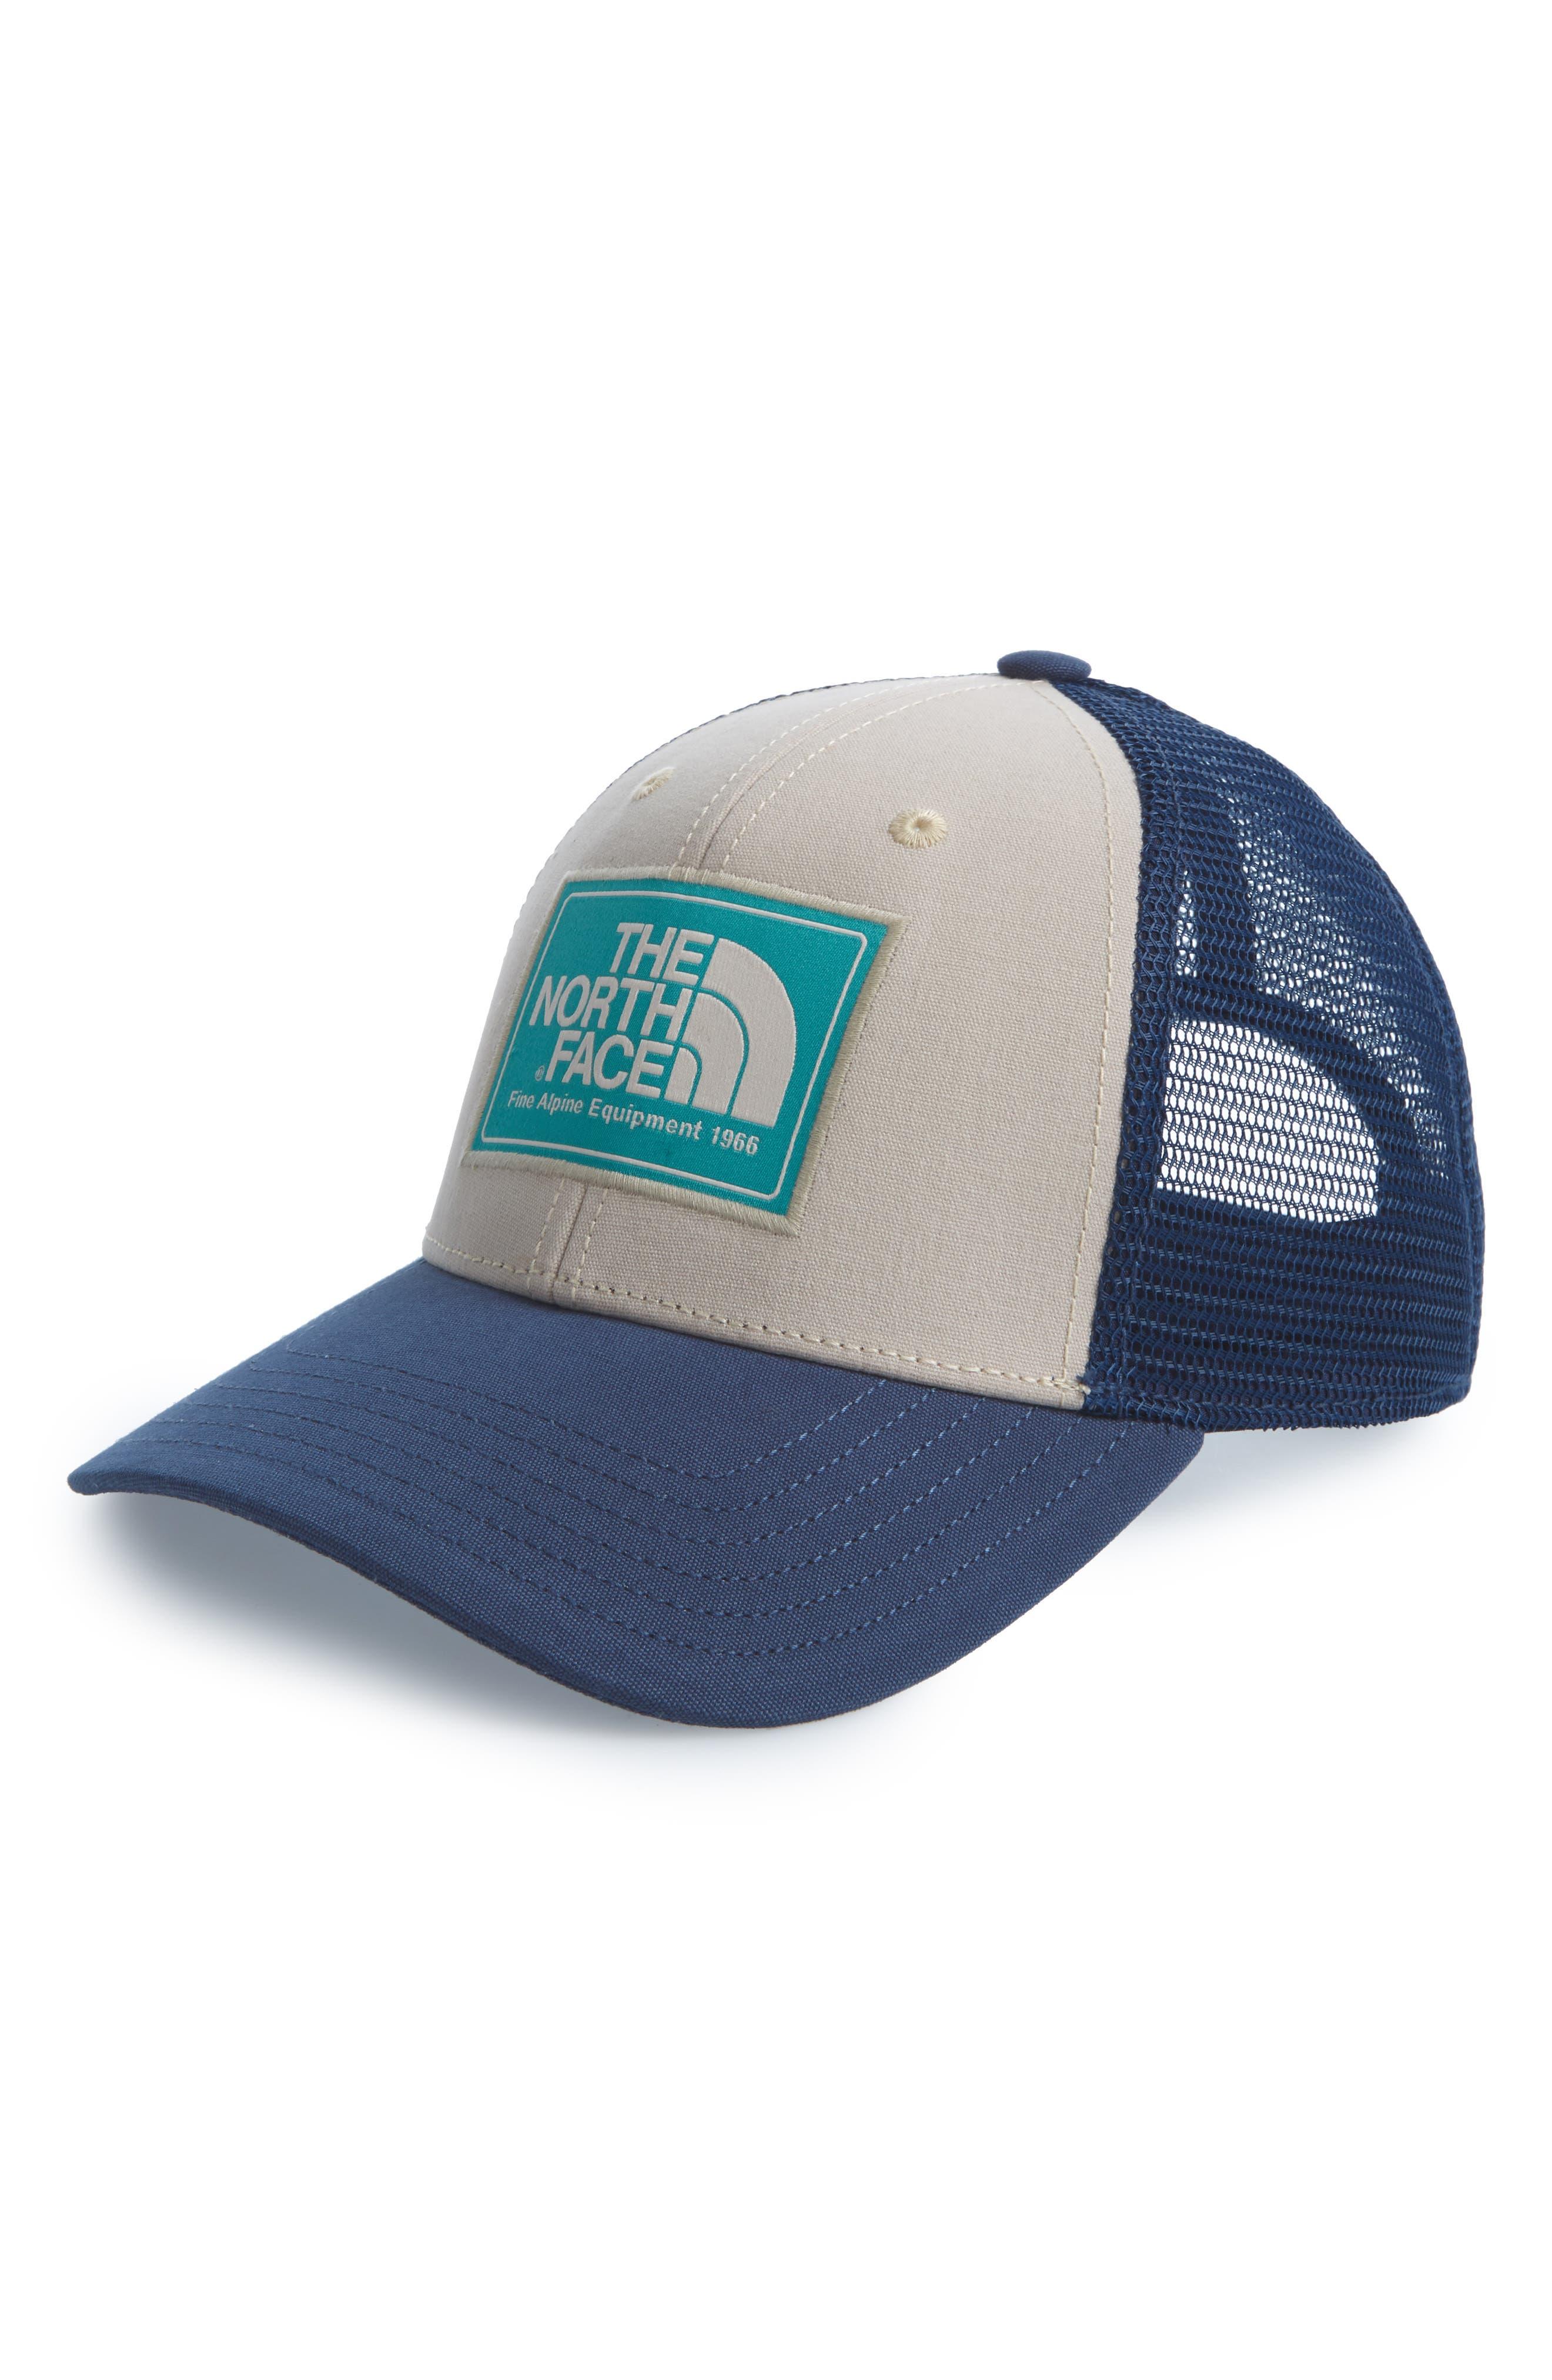 Mudder Trucker Hat,                             Main thumbnail 1, color,                             BEIGE/ BLUE/ GREEN